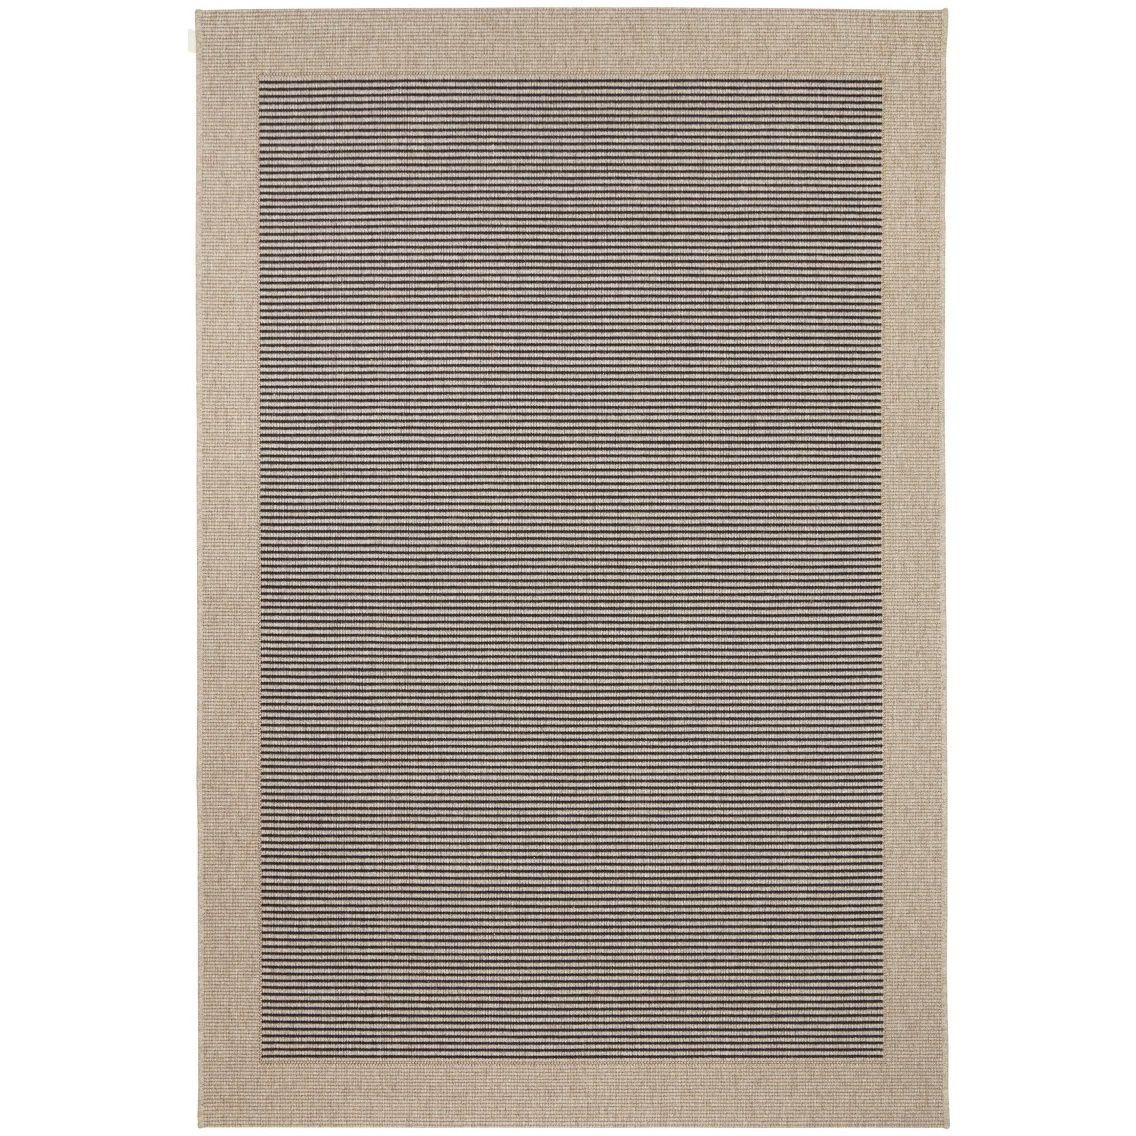 Carpet Casablanca 15044 | Beige/Black-XS